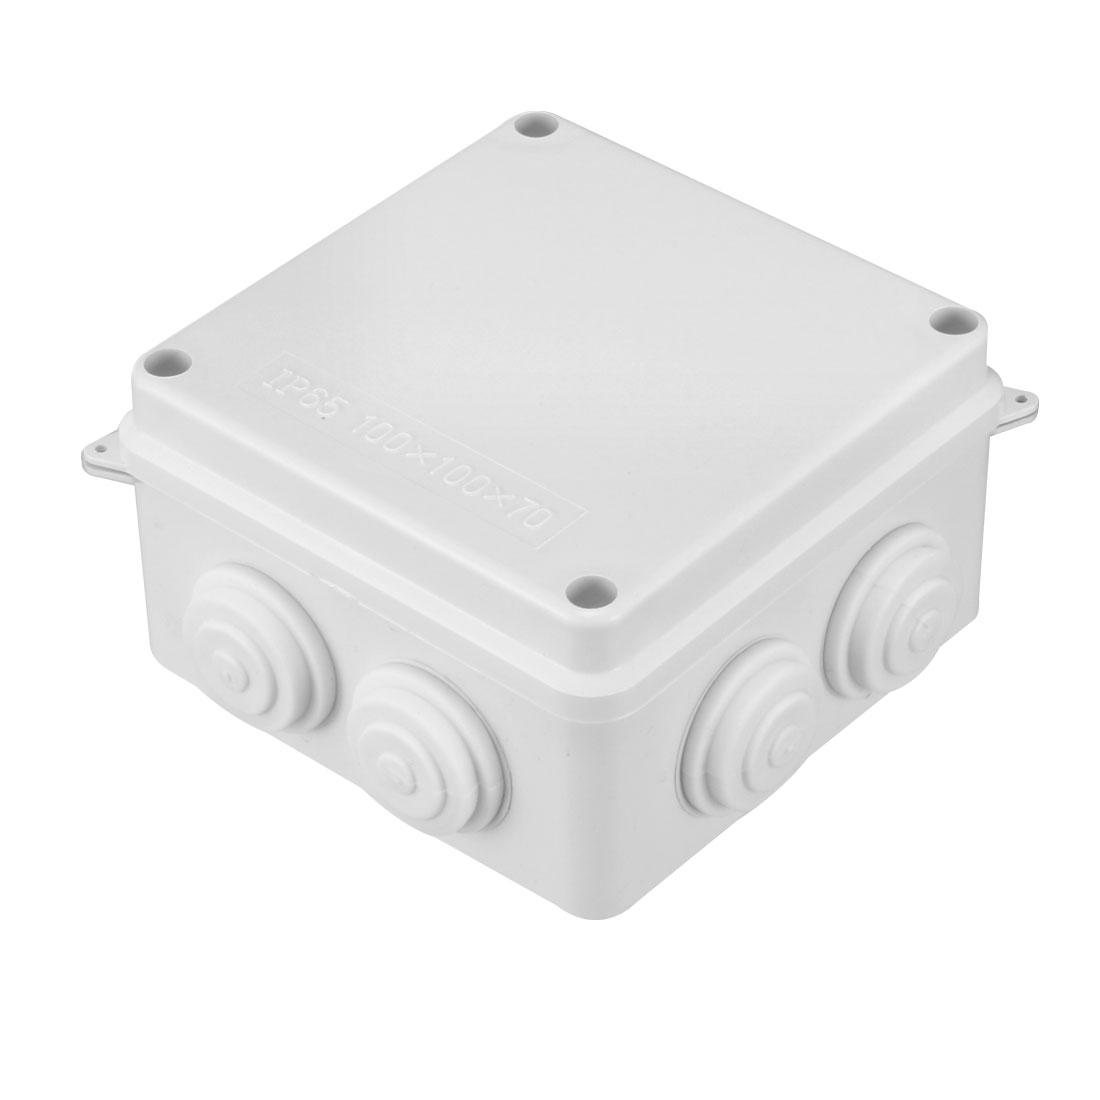 100 x 100 x 70mm Electronic Plastic DIY Junction Box Enclosure Case White